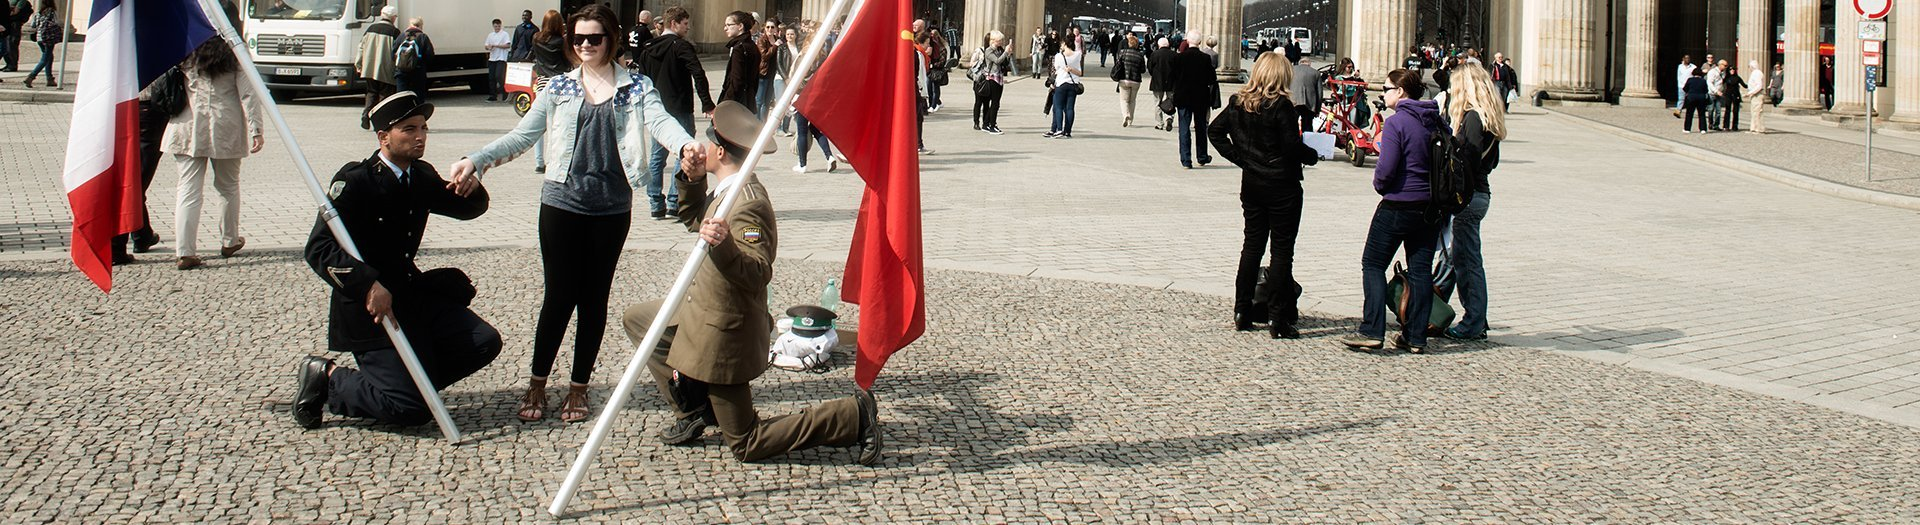 102 NH Berlin — Photo Morten Rygaar All copyrights